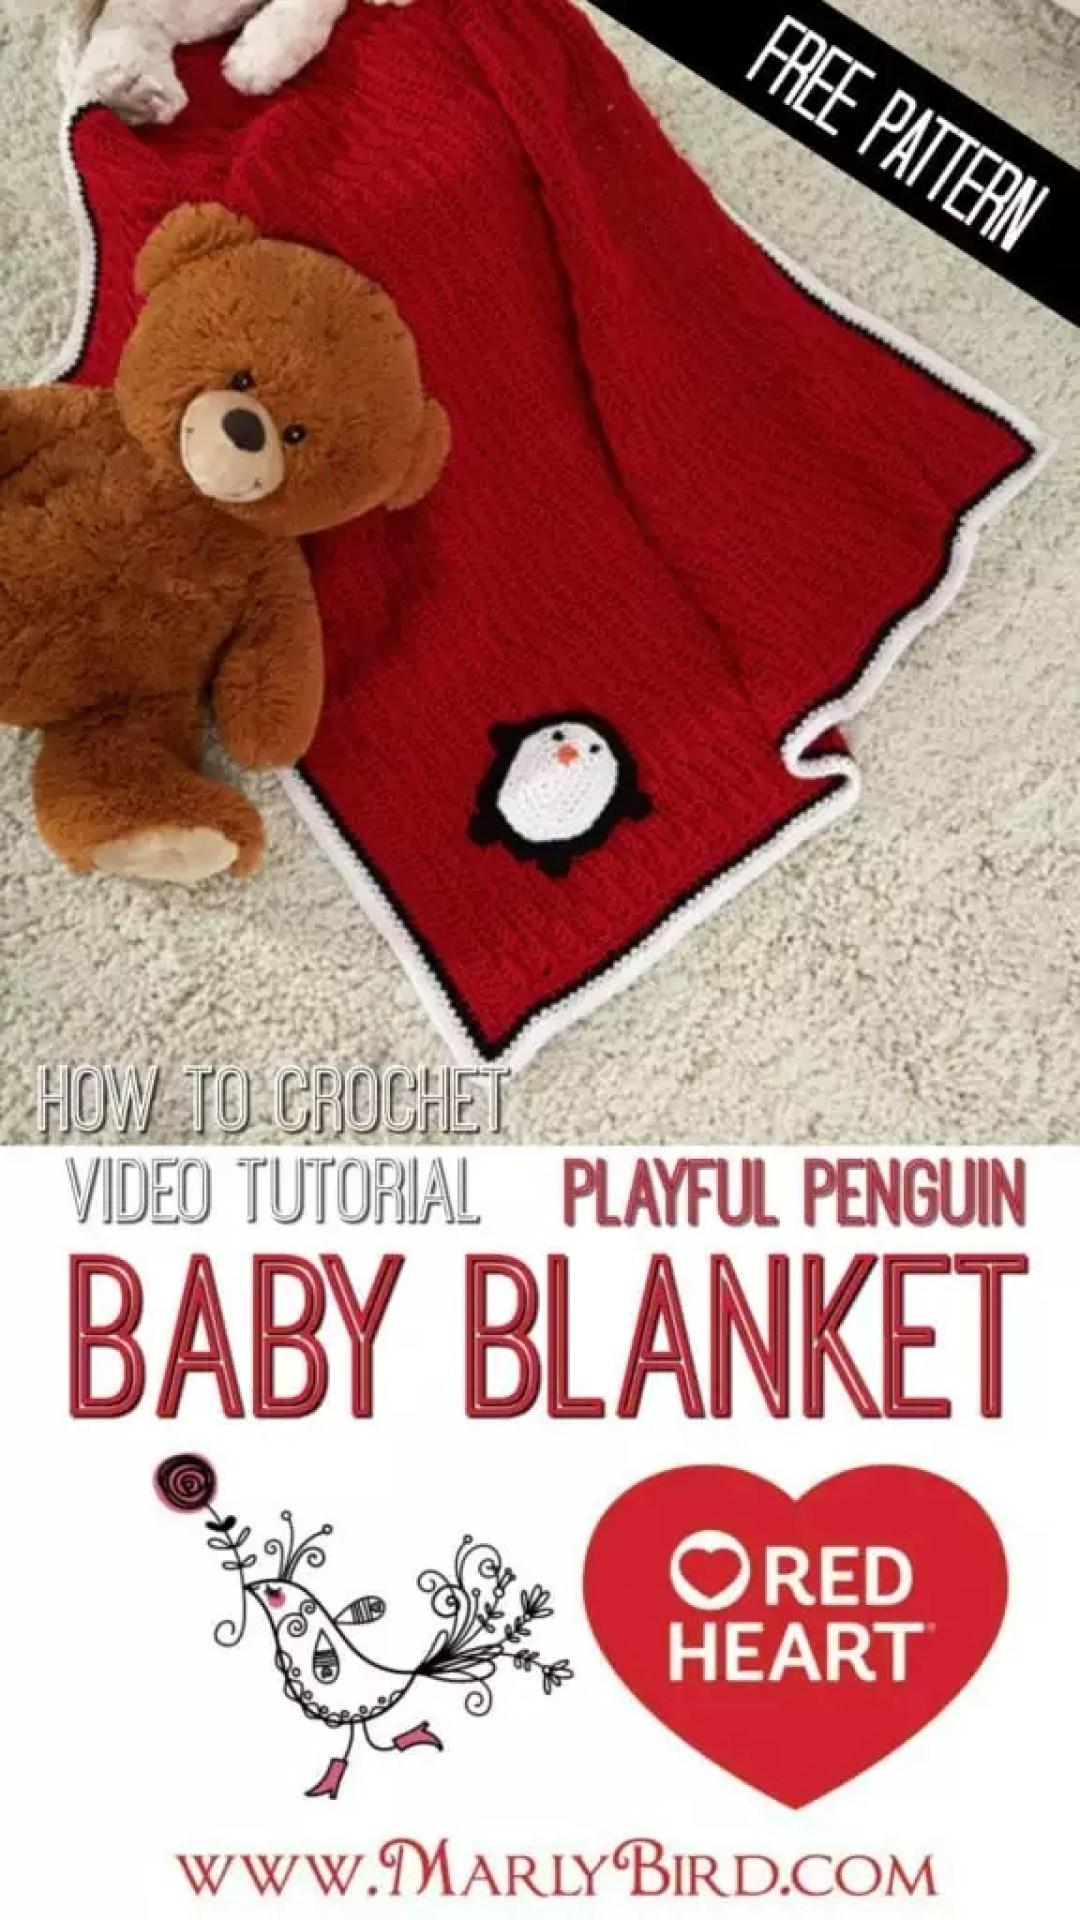 How To Crochet the Playful Penguin Blanket